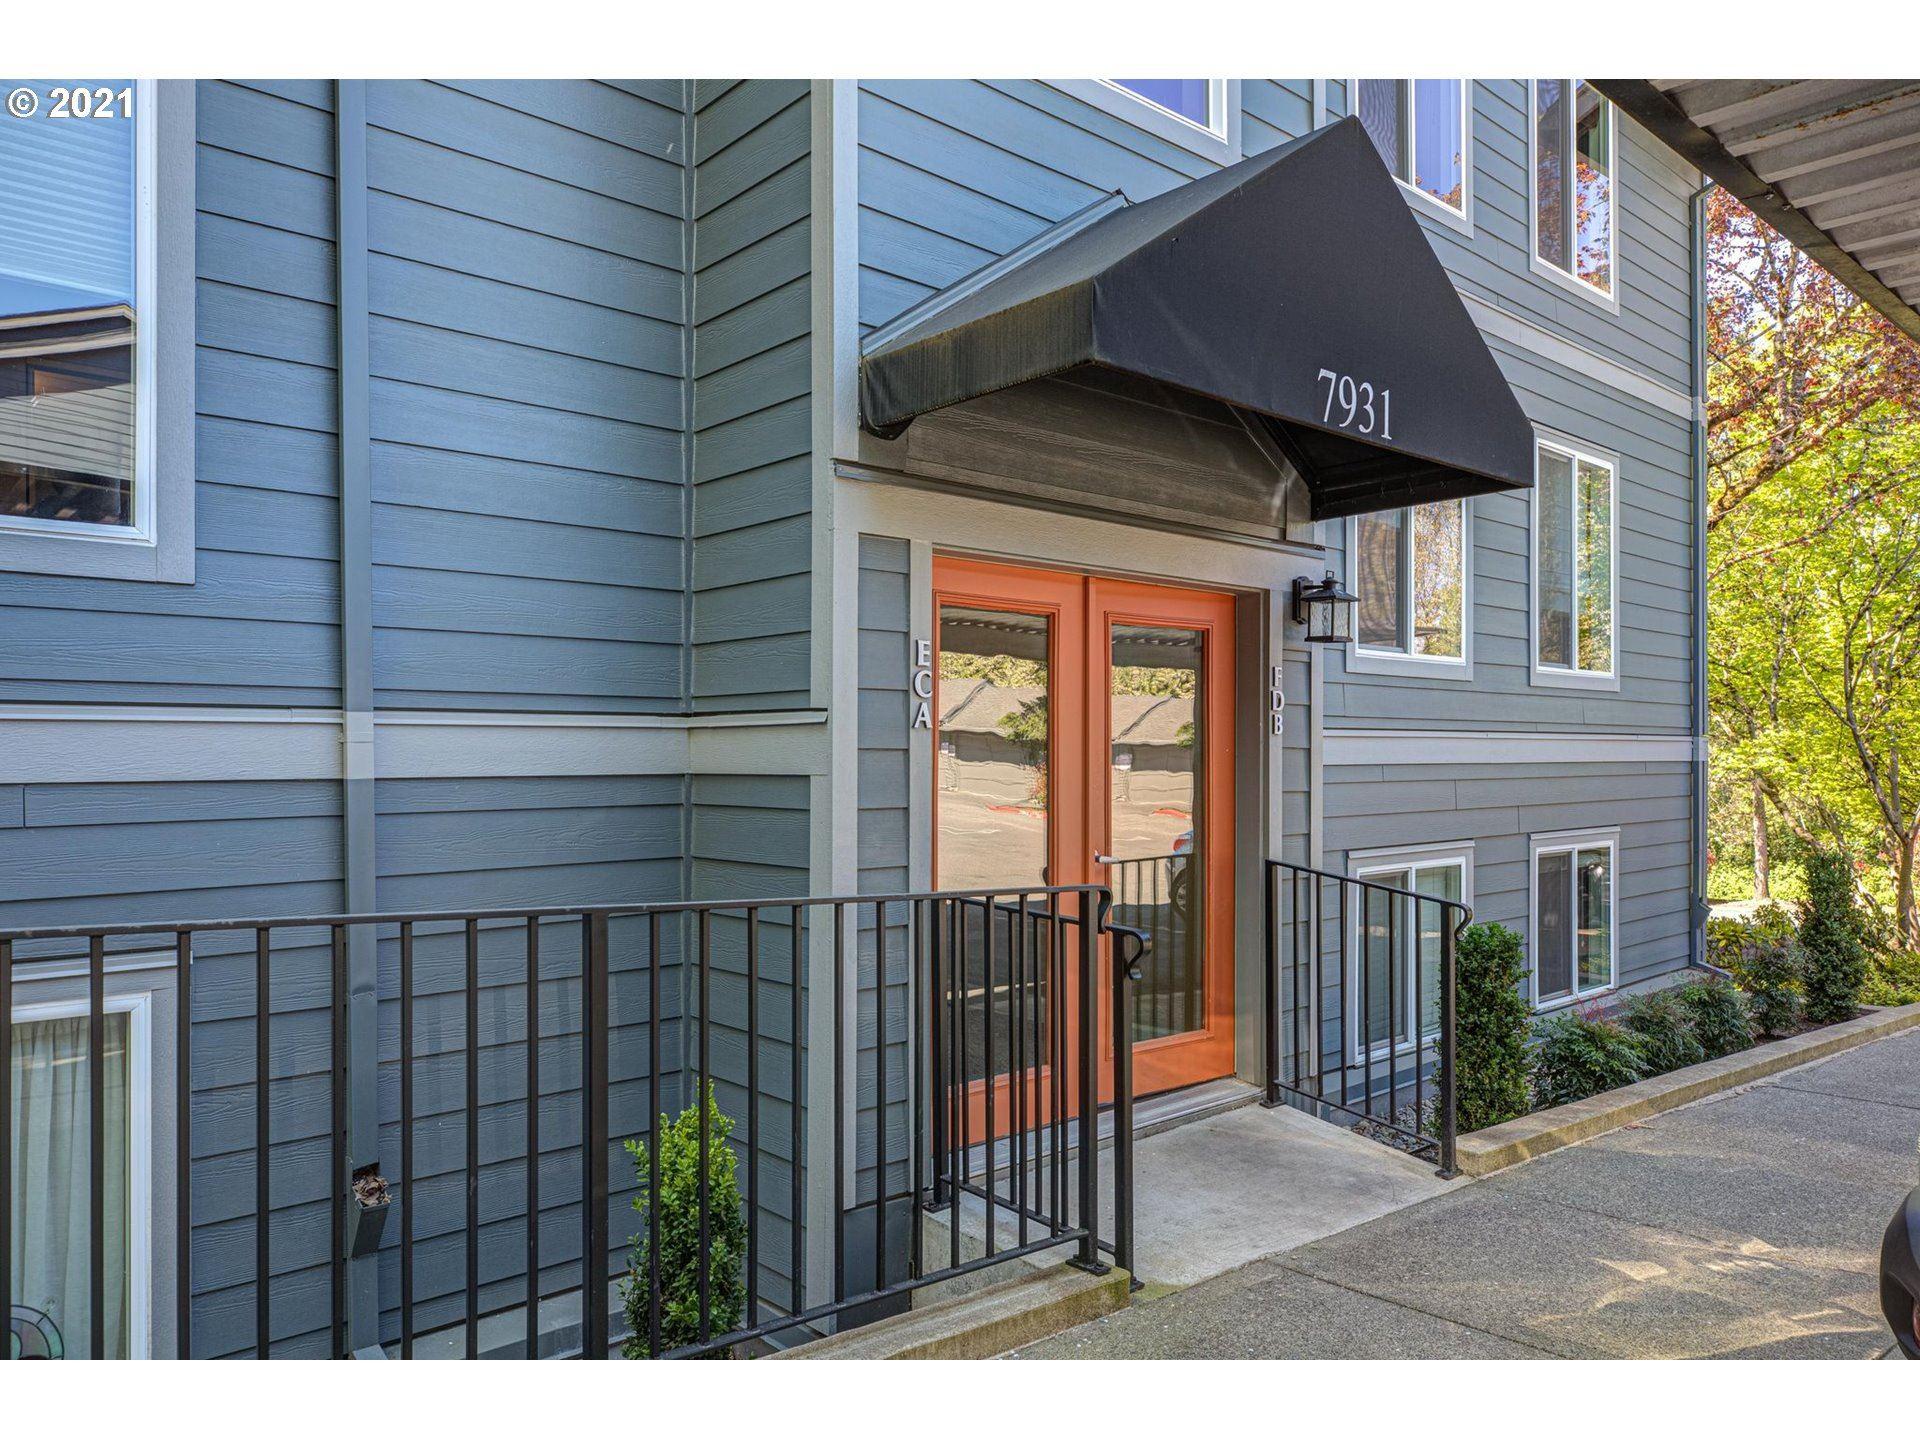 7931 SW 40TH AVE #F, Portland, OR 97219 - MLS#: 21284920